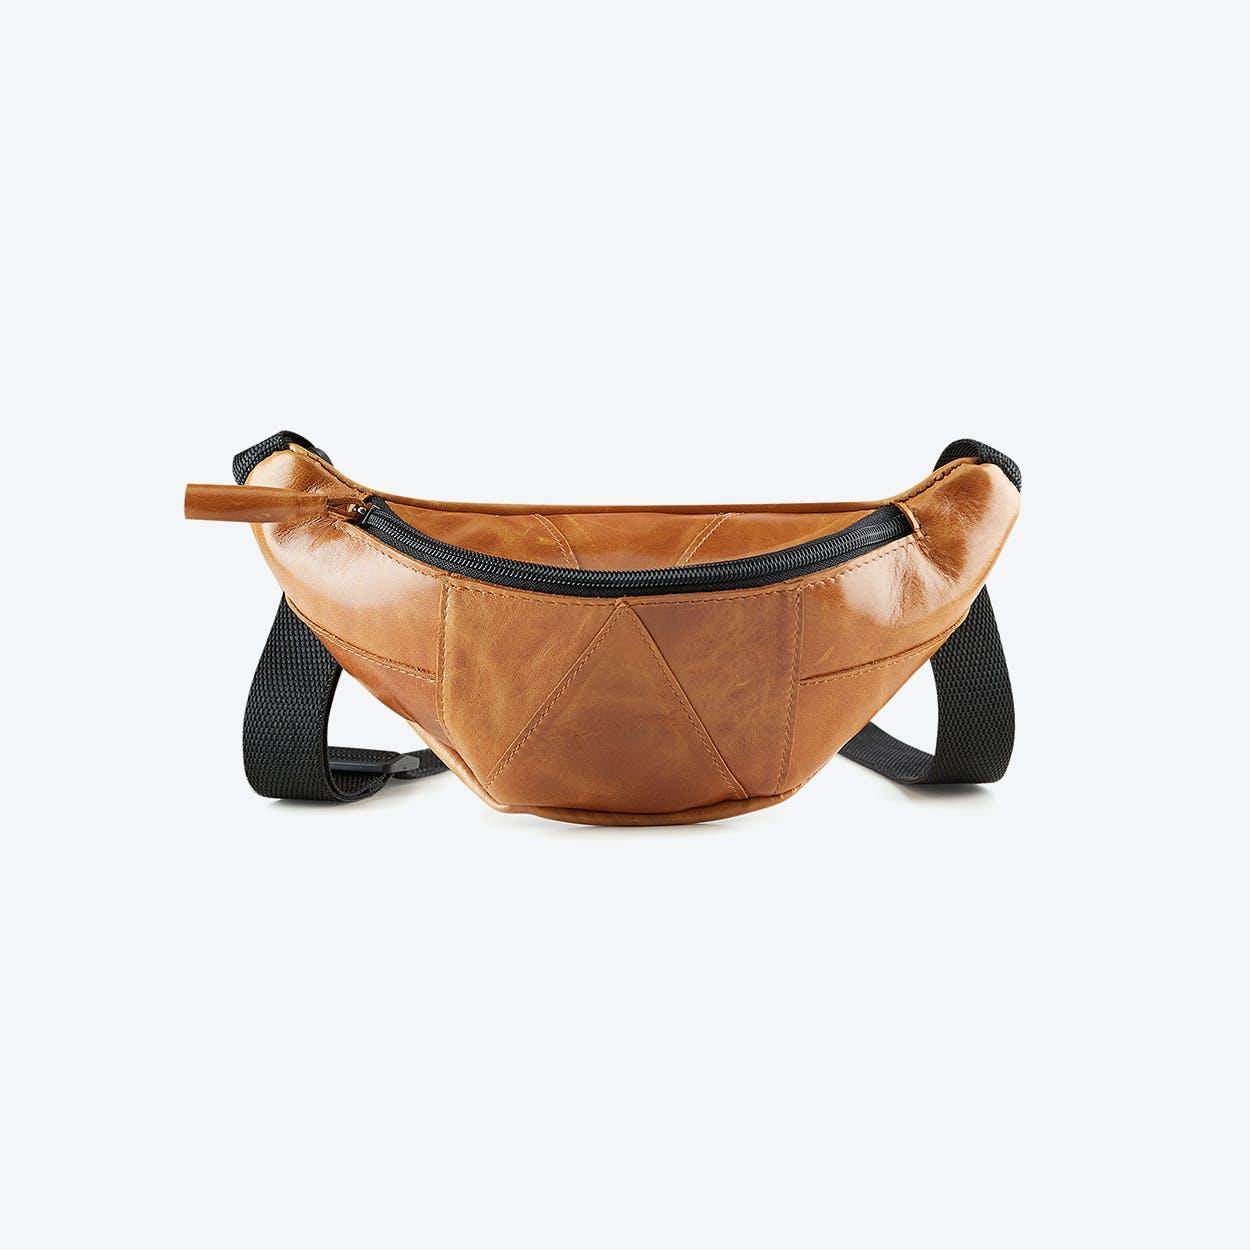 Banana Belt Bag in Brown Leather